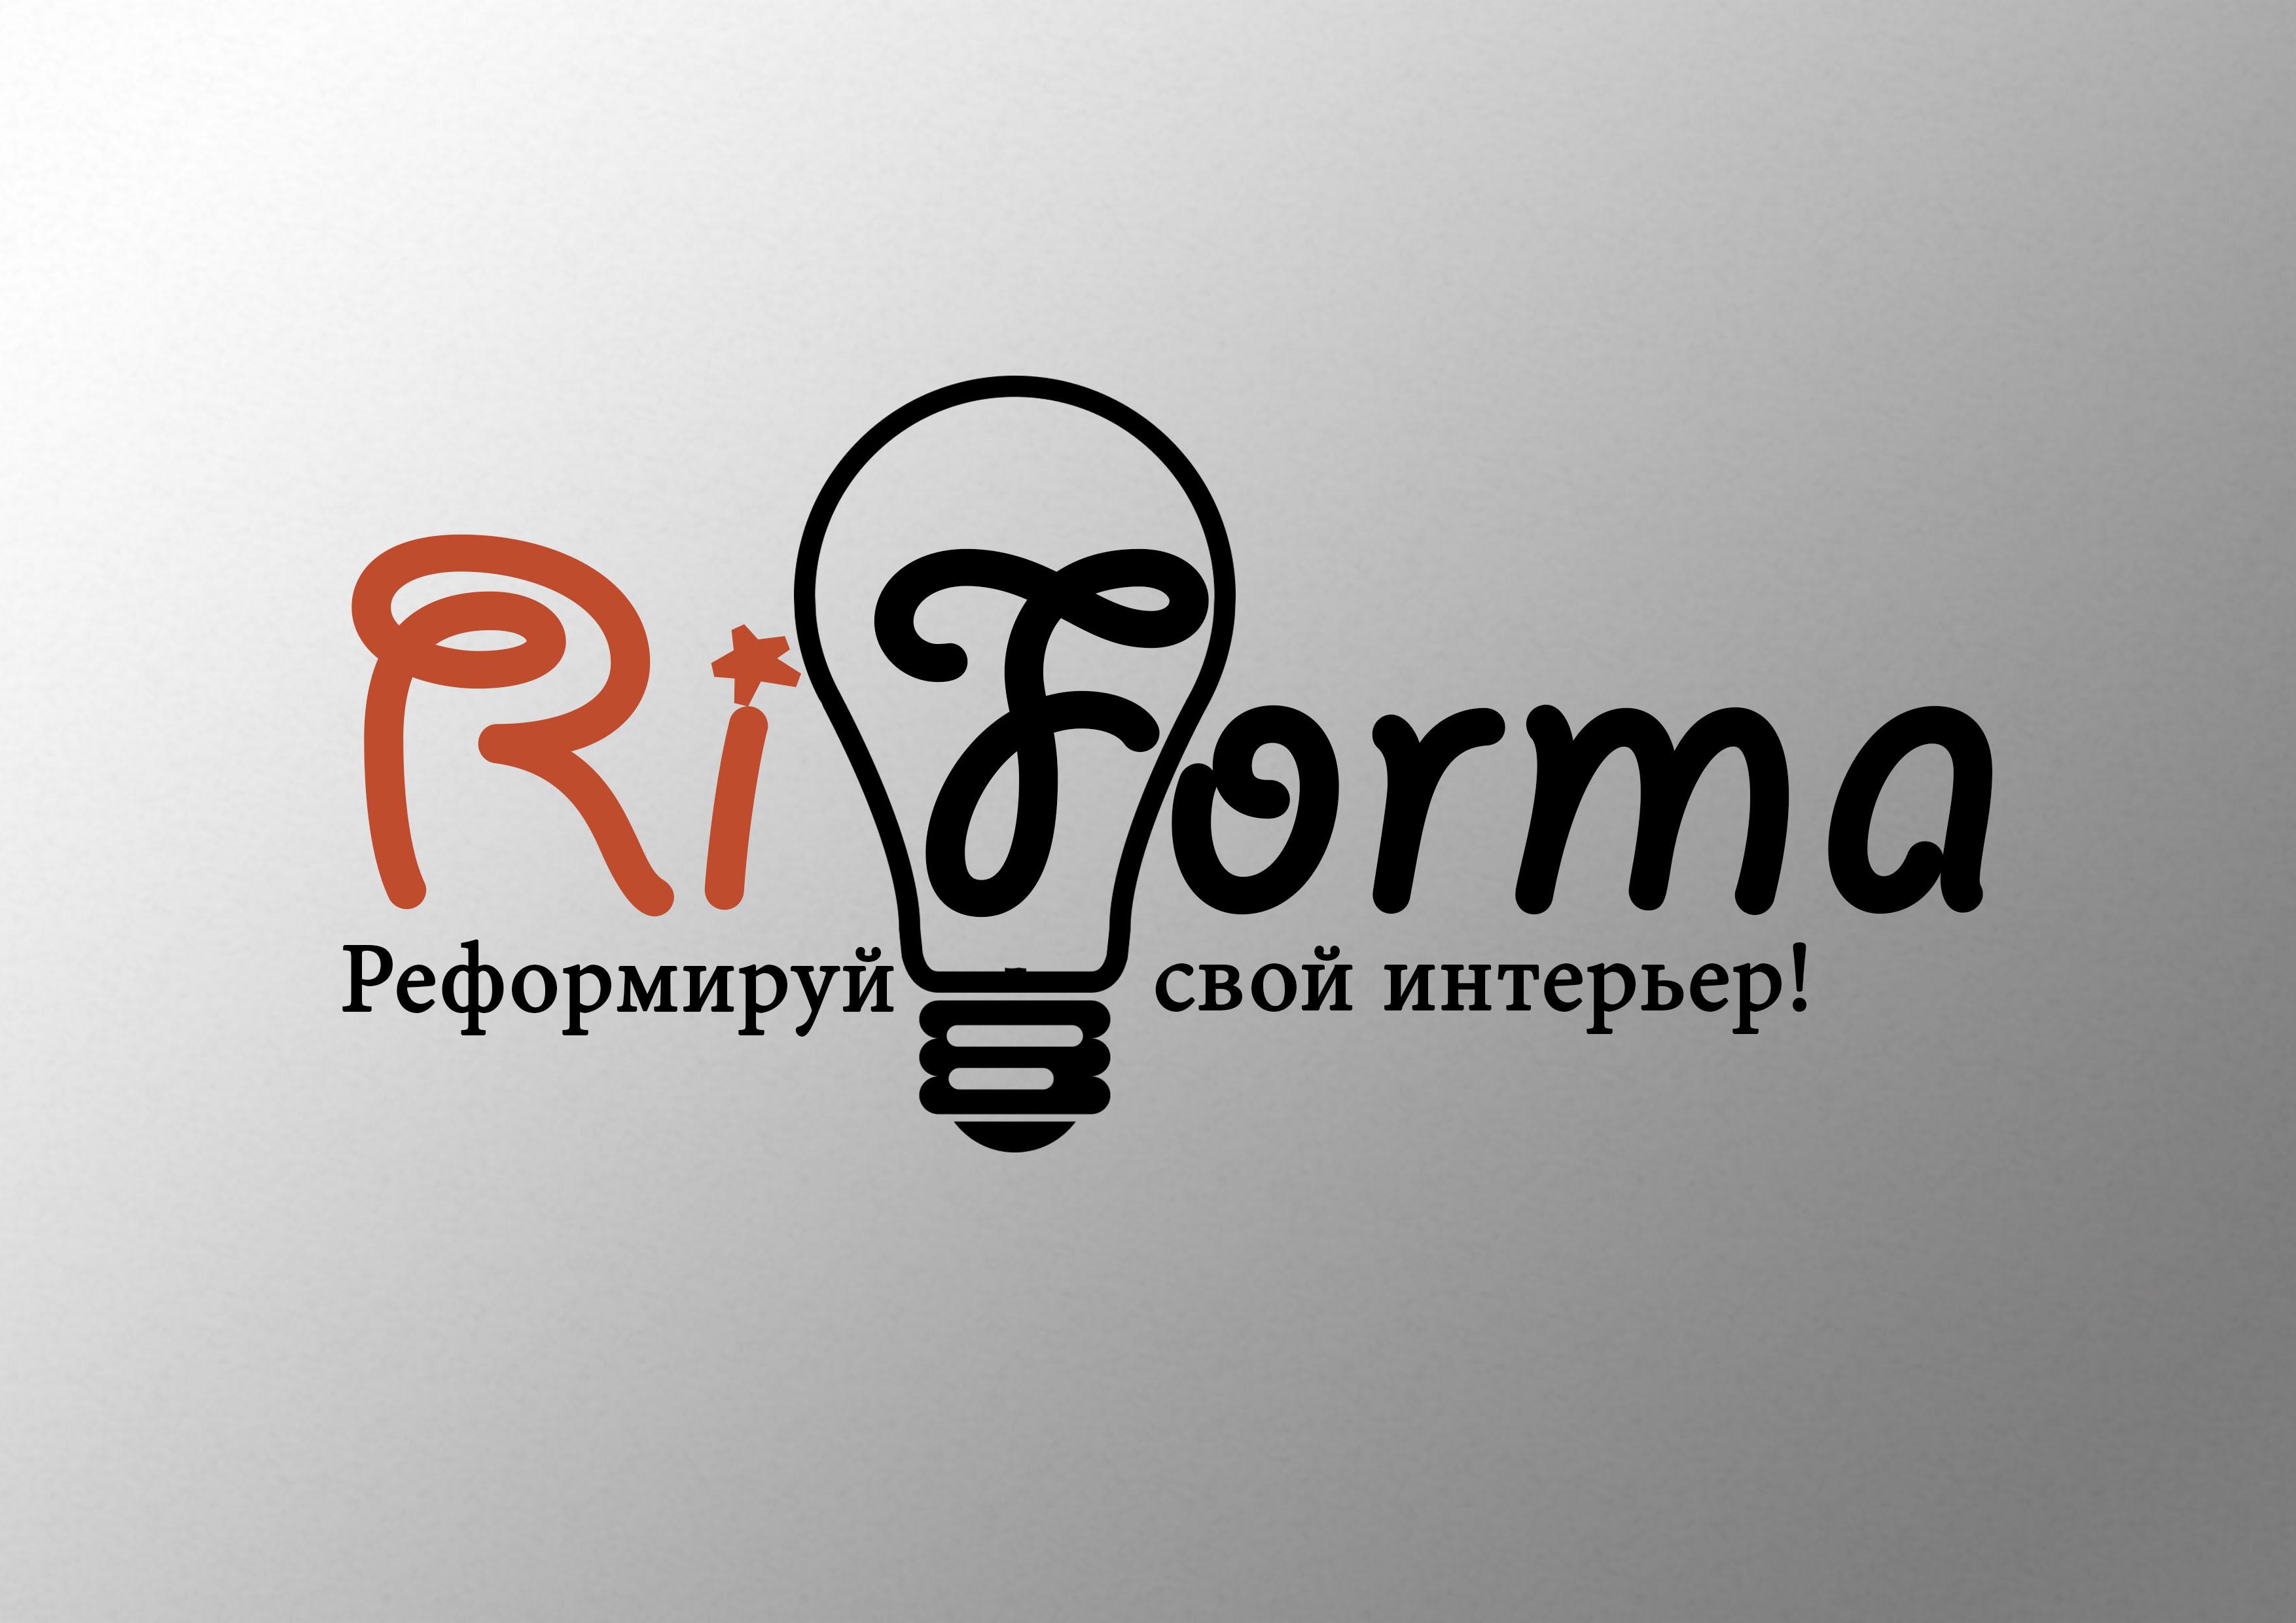 Разработка логотипа и элементов фирменного стиля фото f_448579ce552b7664.jpg